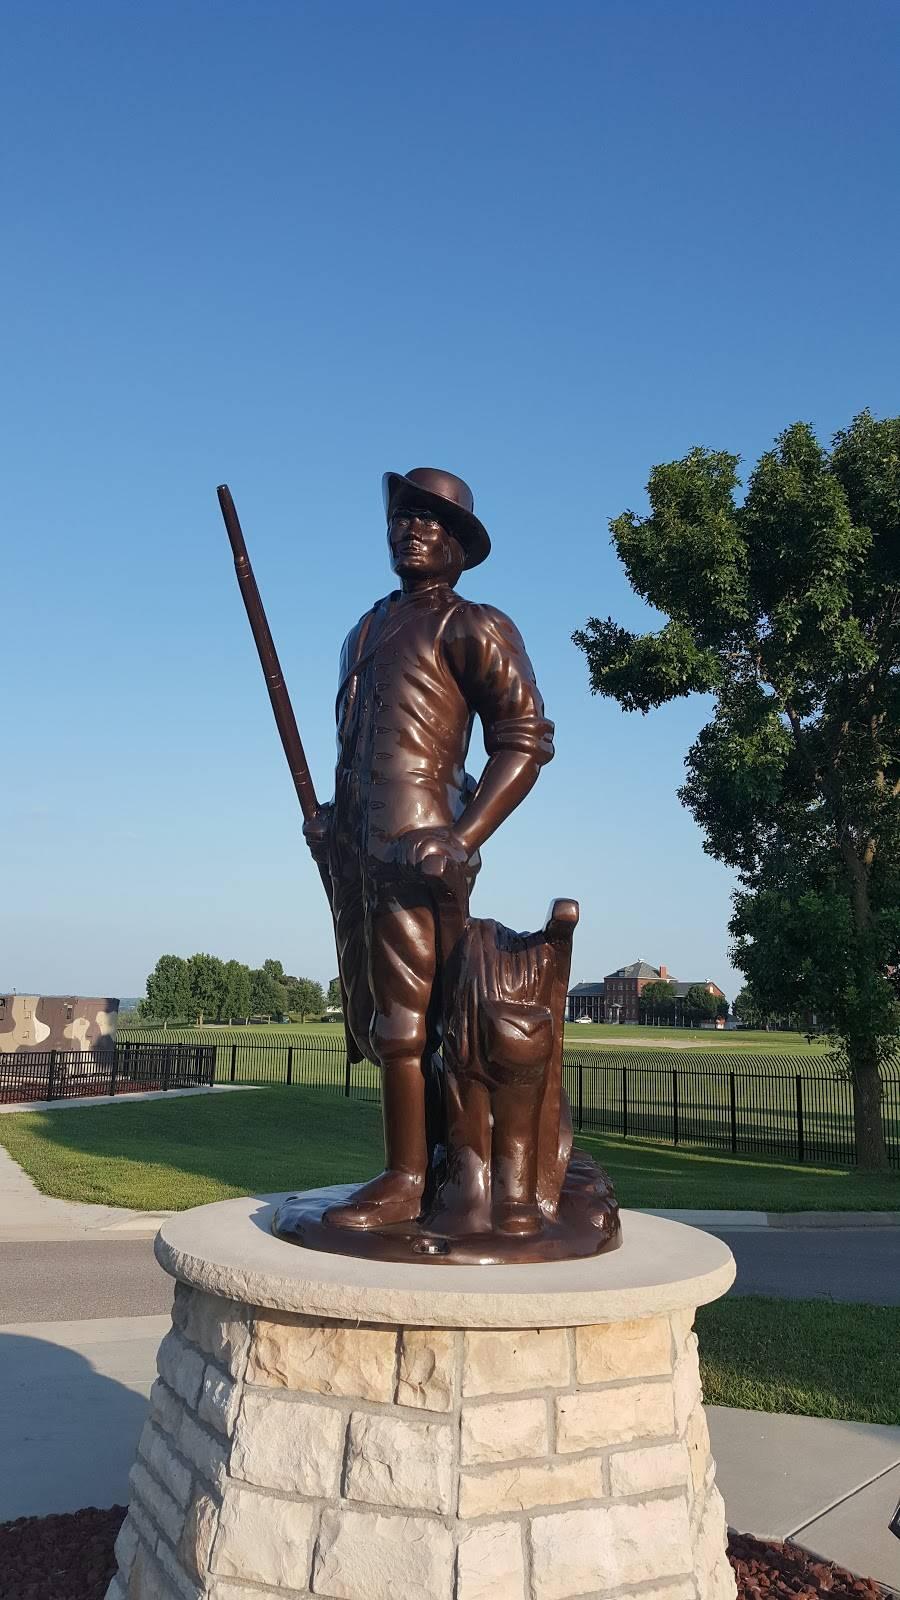 Jefferson Barracks Park - park  | Photo 5 of 10 | Address: 345 North Rd W, St. Louis, MO 63125, USA | Phone: (314) 615-8800